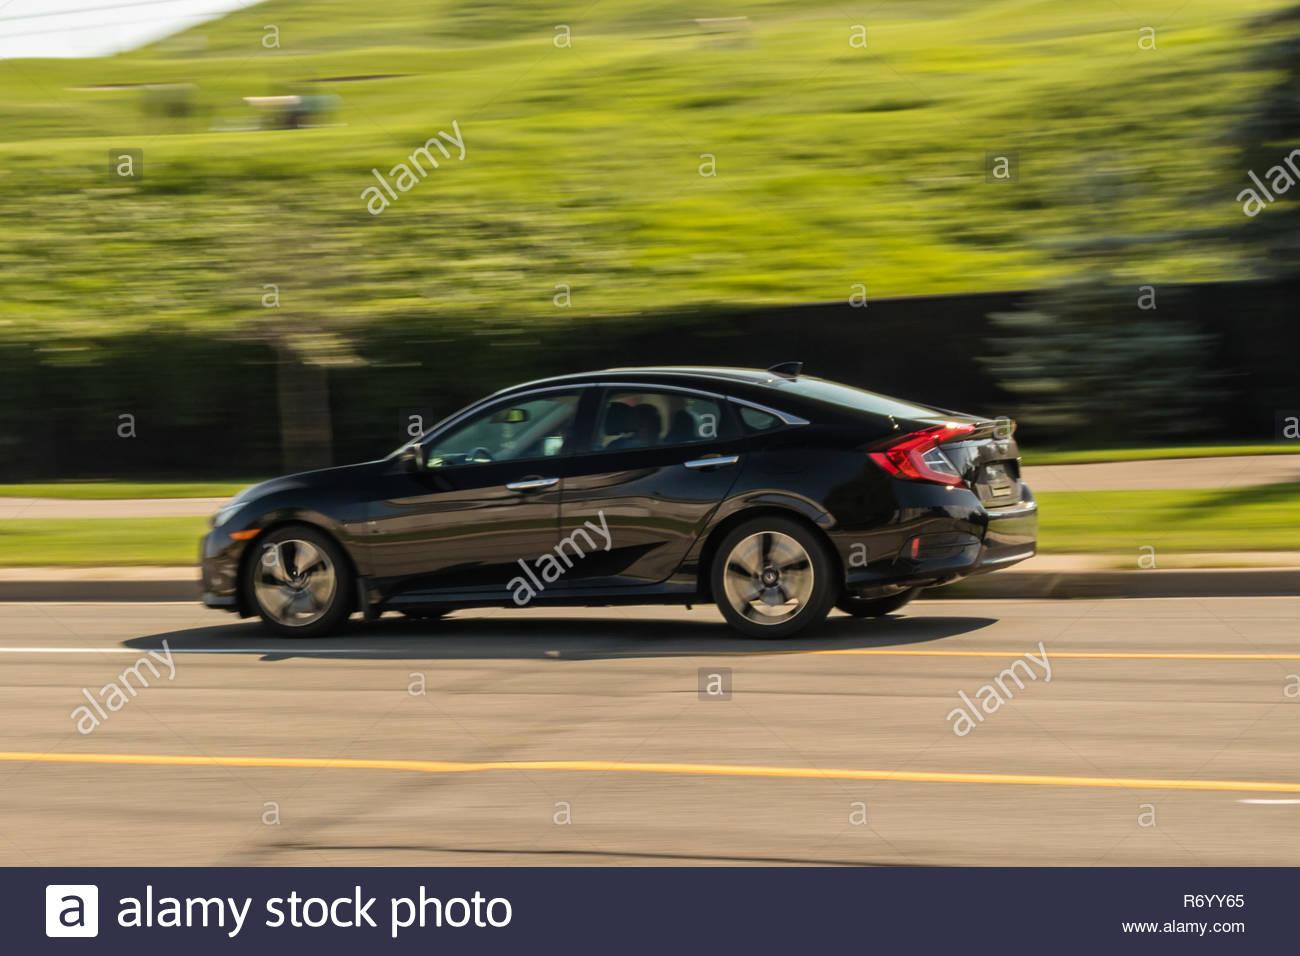 Speeding black full size car - Stock Image